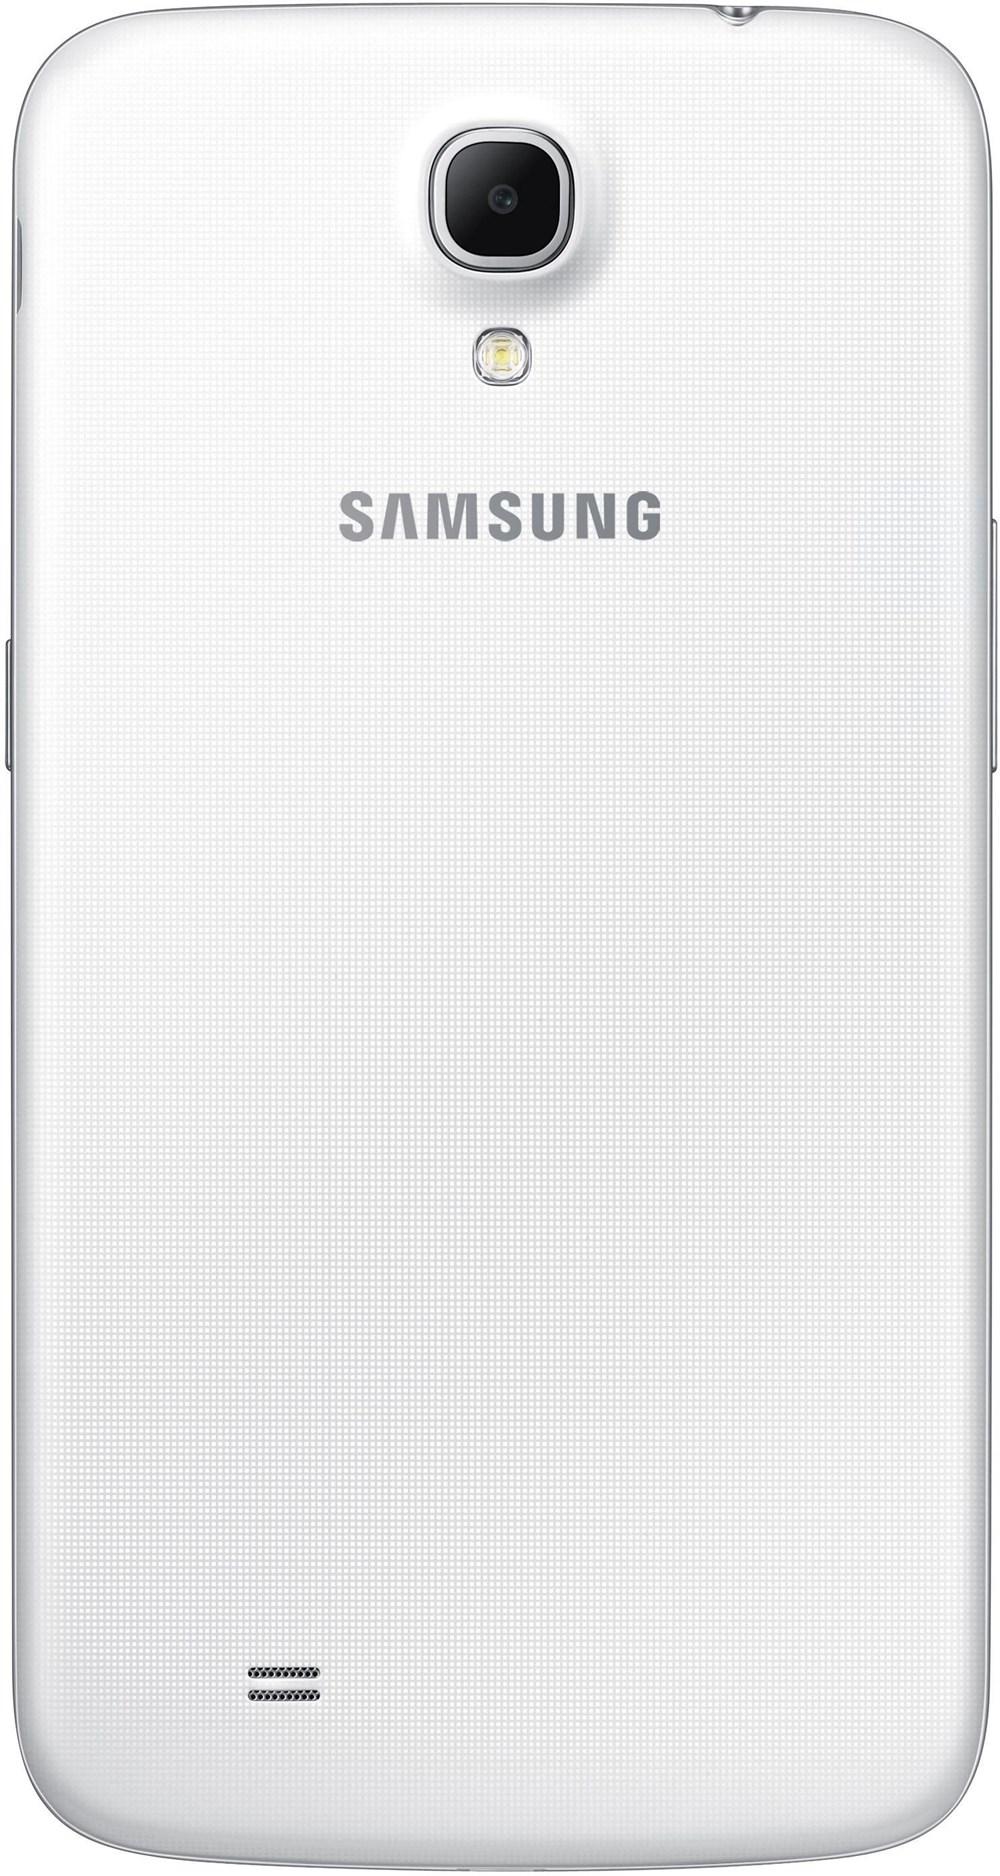 Samsung Galaxy Mega 6.3 8GB Android weiß GT-I9205ZWADBT